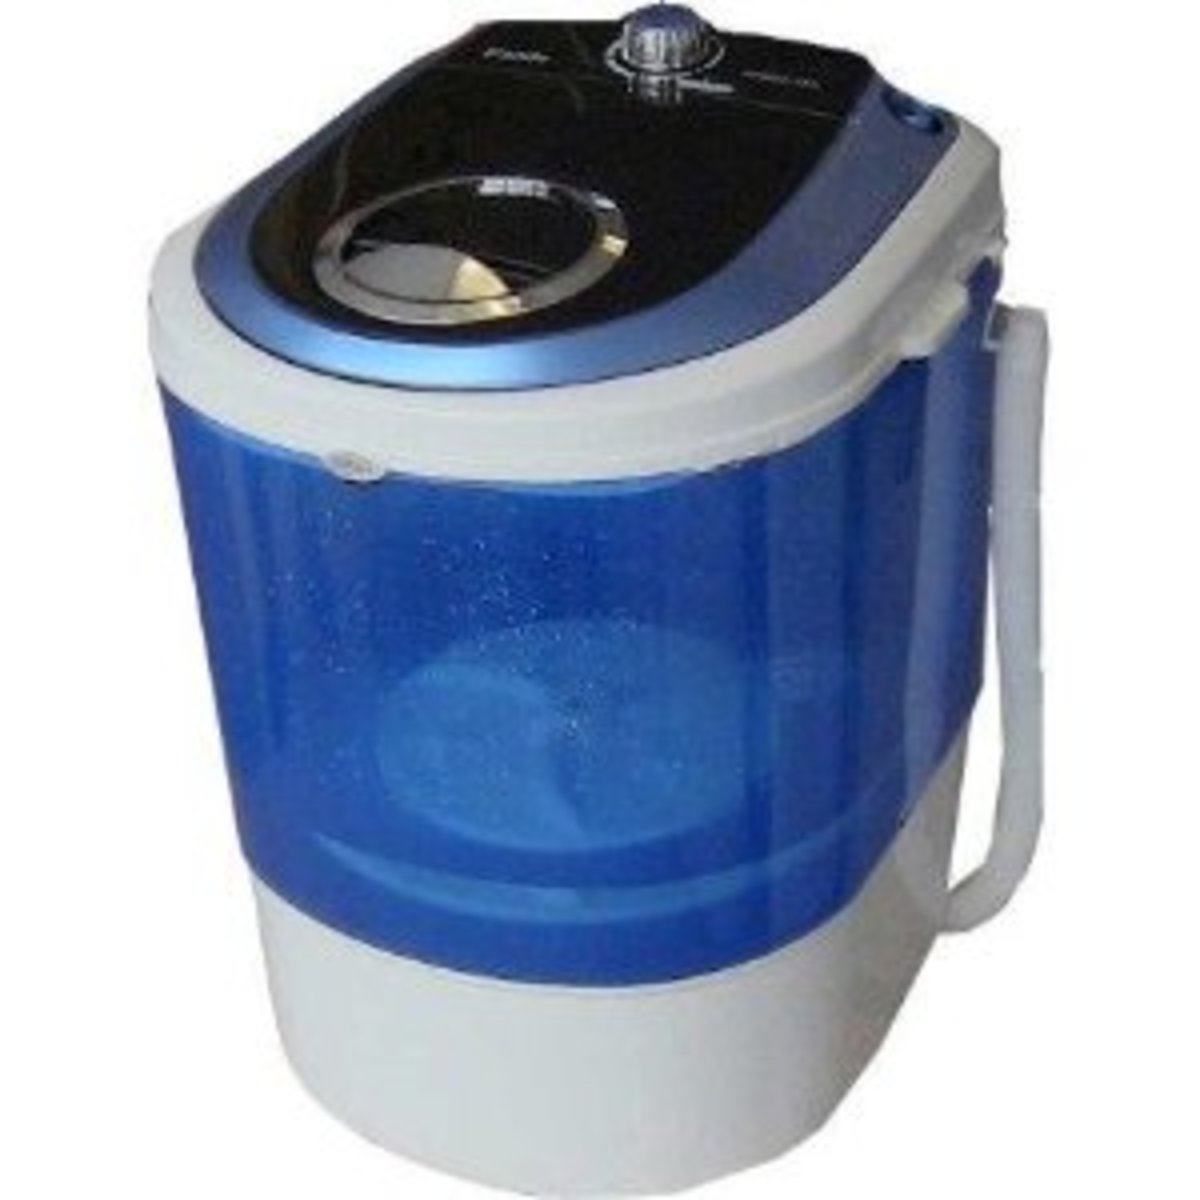 Portable Washing Machine Review